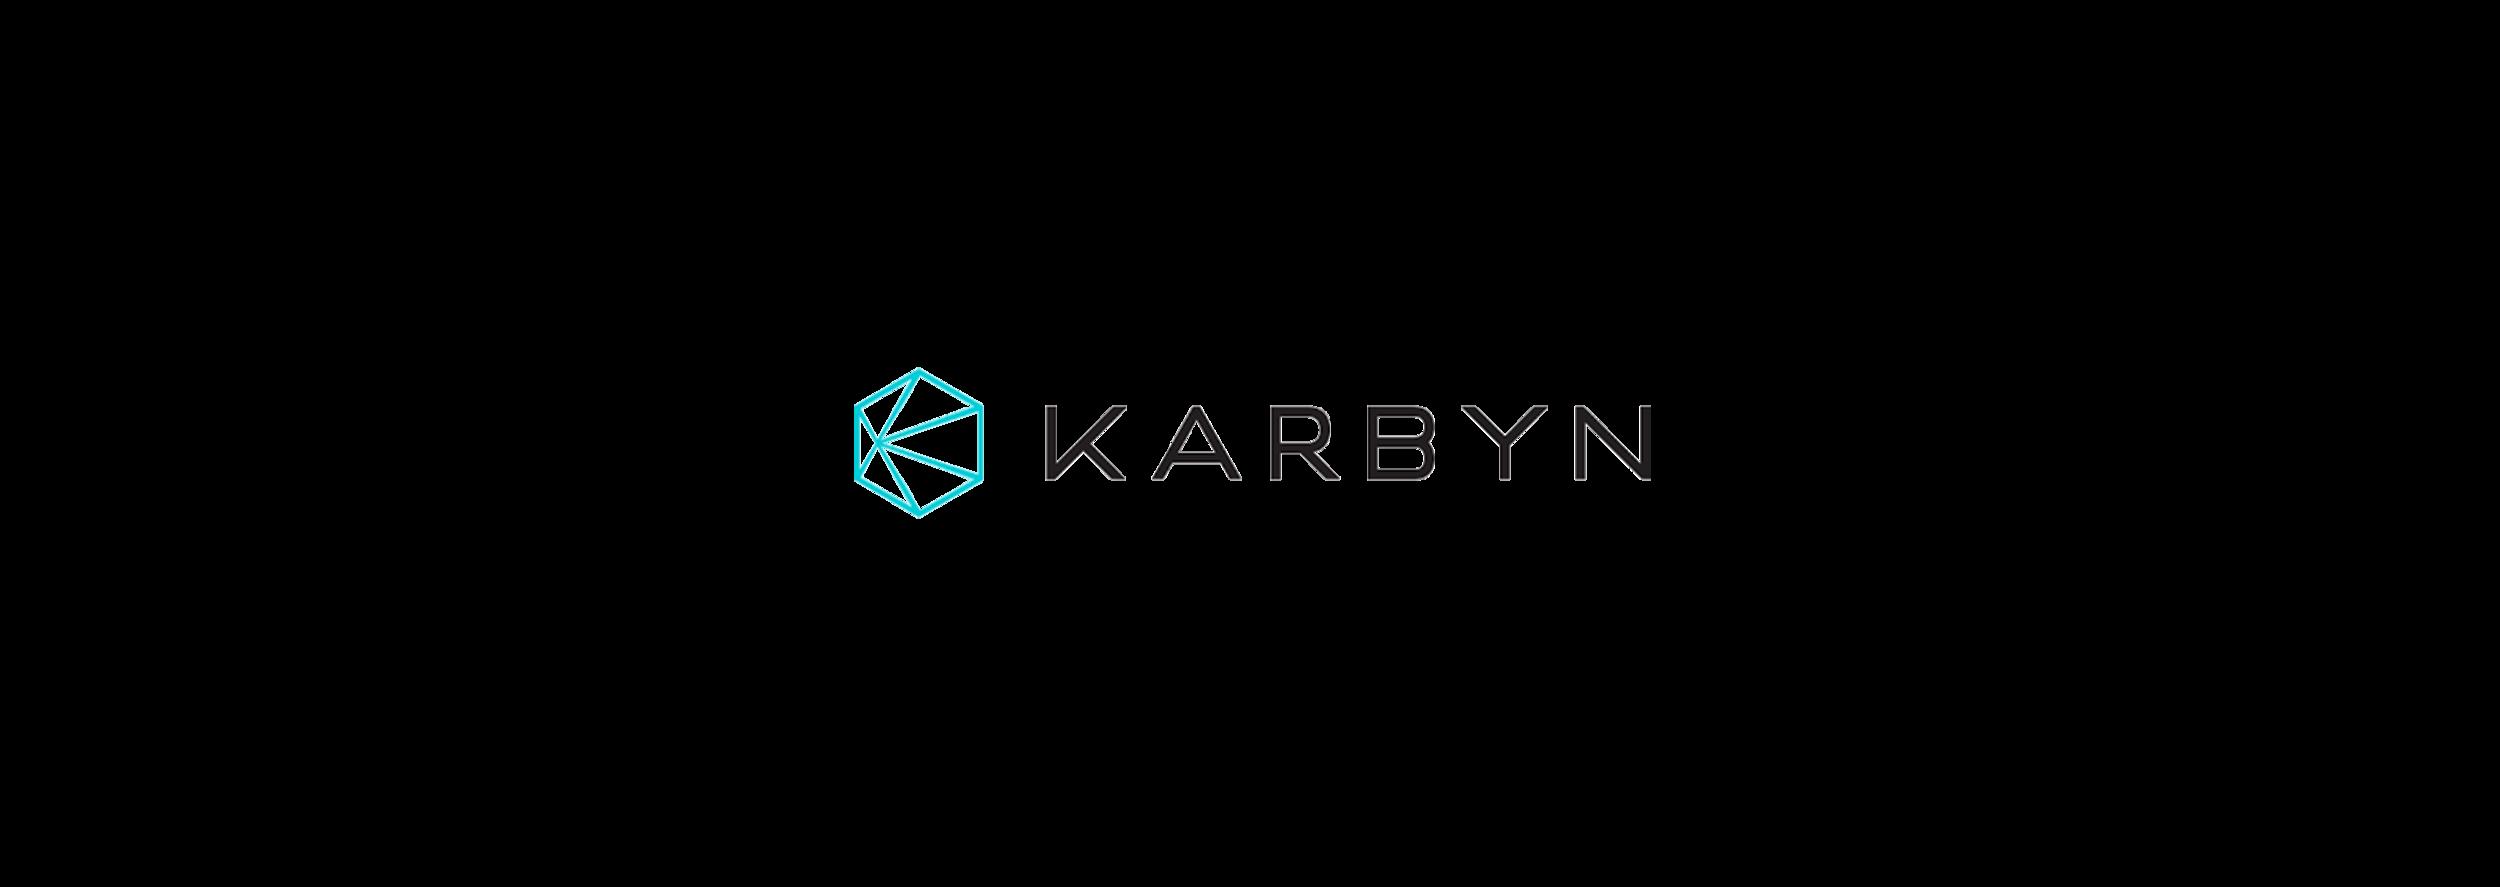 Karbynlong.png